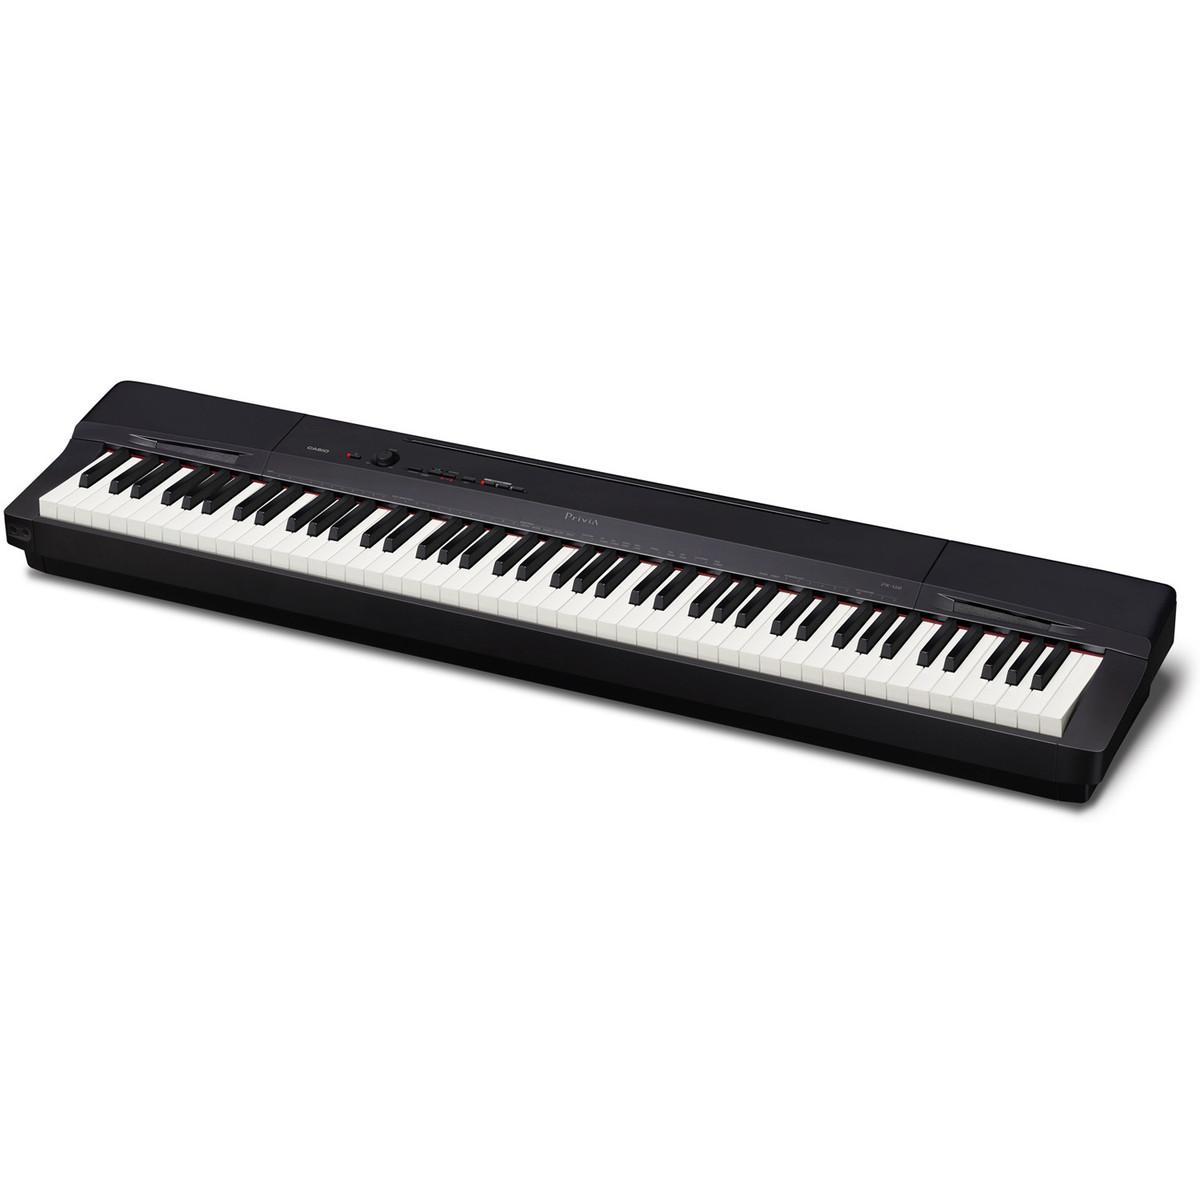 Image of Casio Privia PX-160 Digital Piano